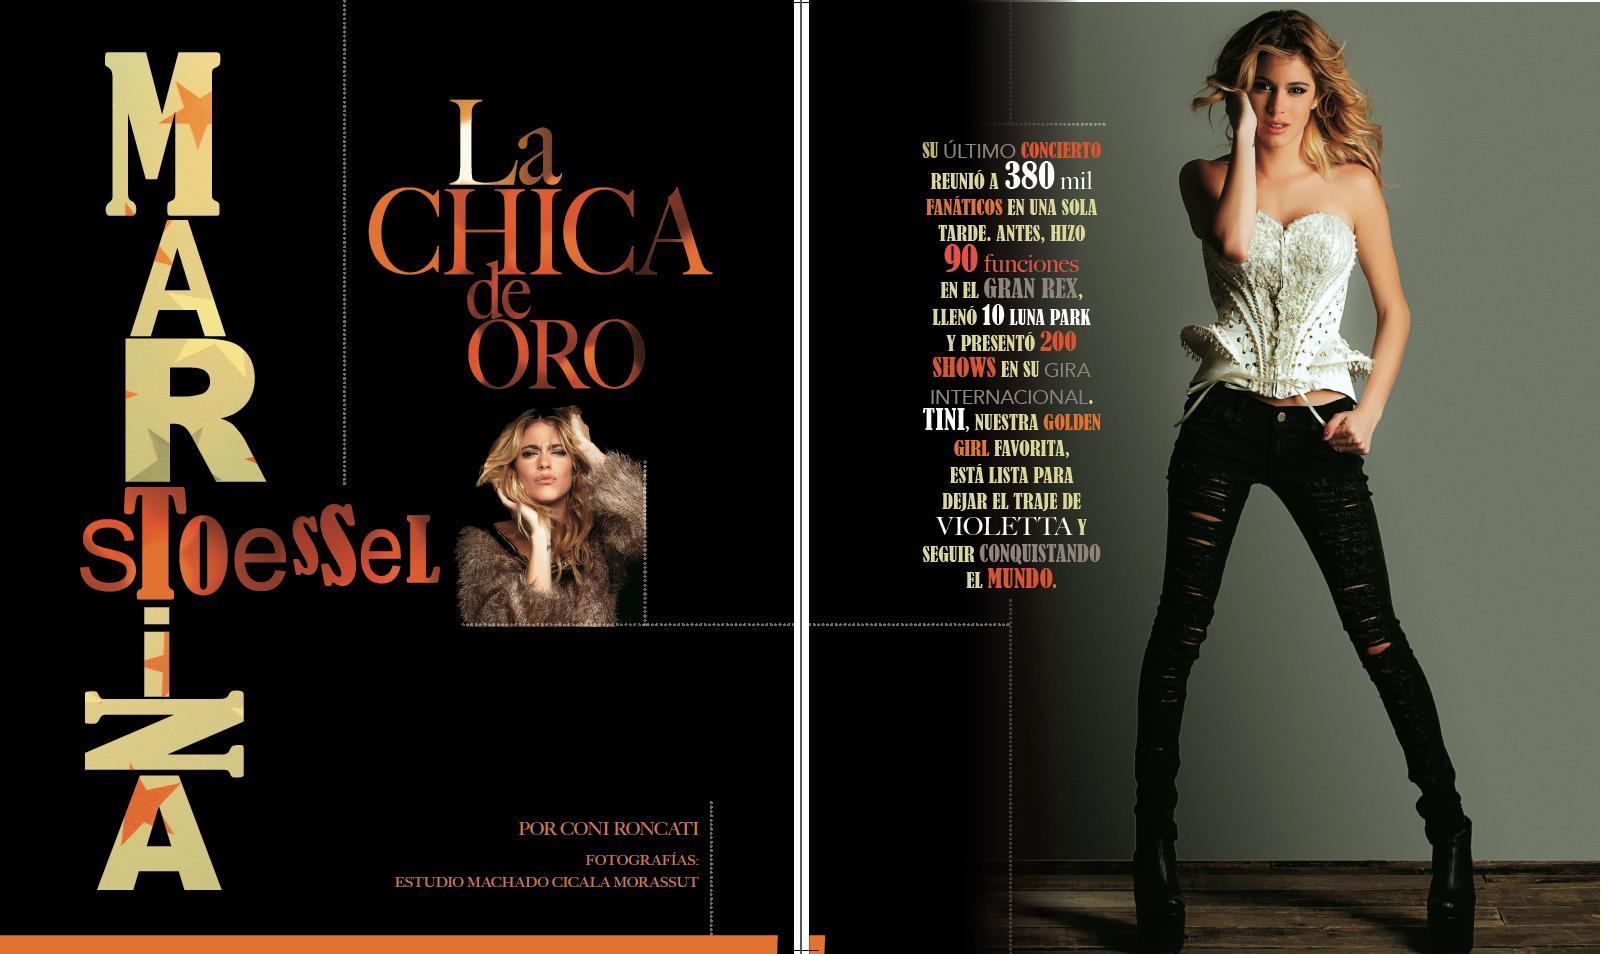 Martina pour le magazine El Planeta Urbano!!